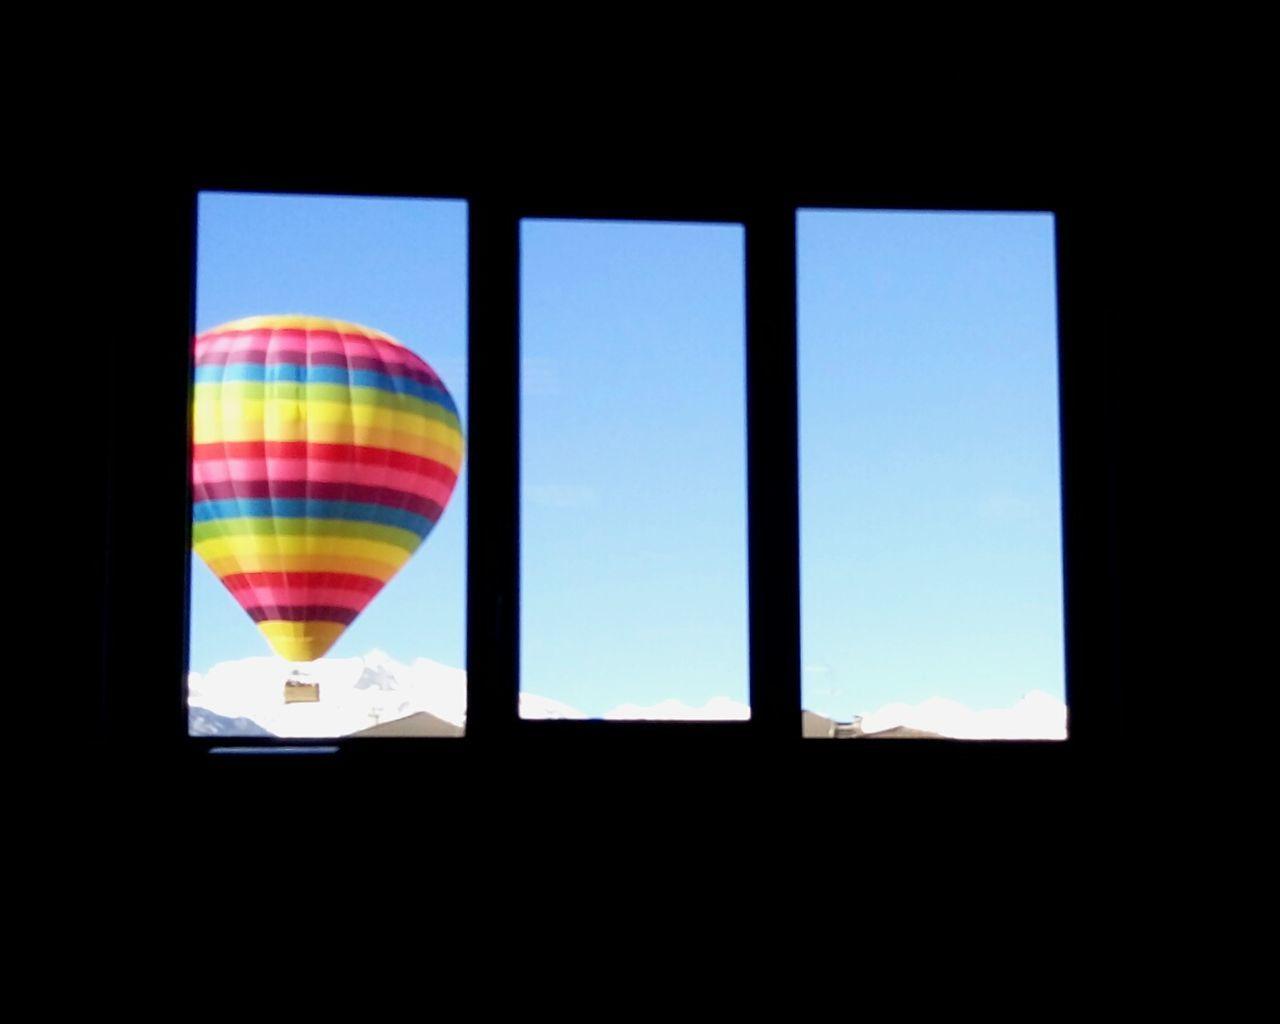 Ti coloro la giornata Multi Colored Window City Sky Day No People Outdoors Hot Air Balloon Rainbow Windows Colors Hope Dream Children Dreams Happiness Fly presso Aosta Aosta Valley Italy Italia EyeEmNewHere TCPM BYOPaper!